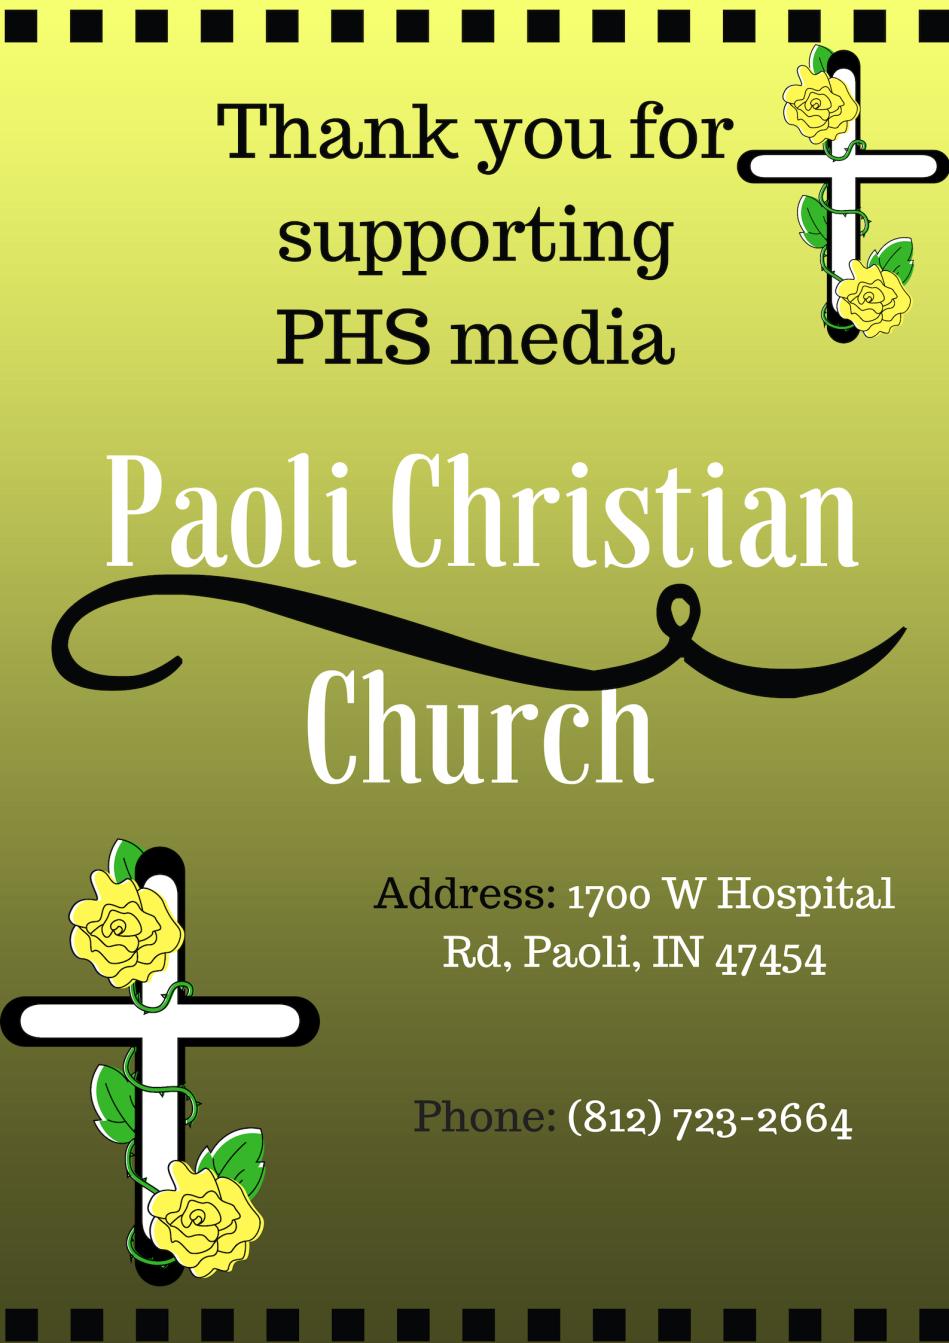 Paoli Christian Church Nicholson.png